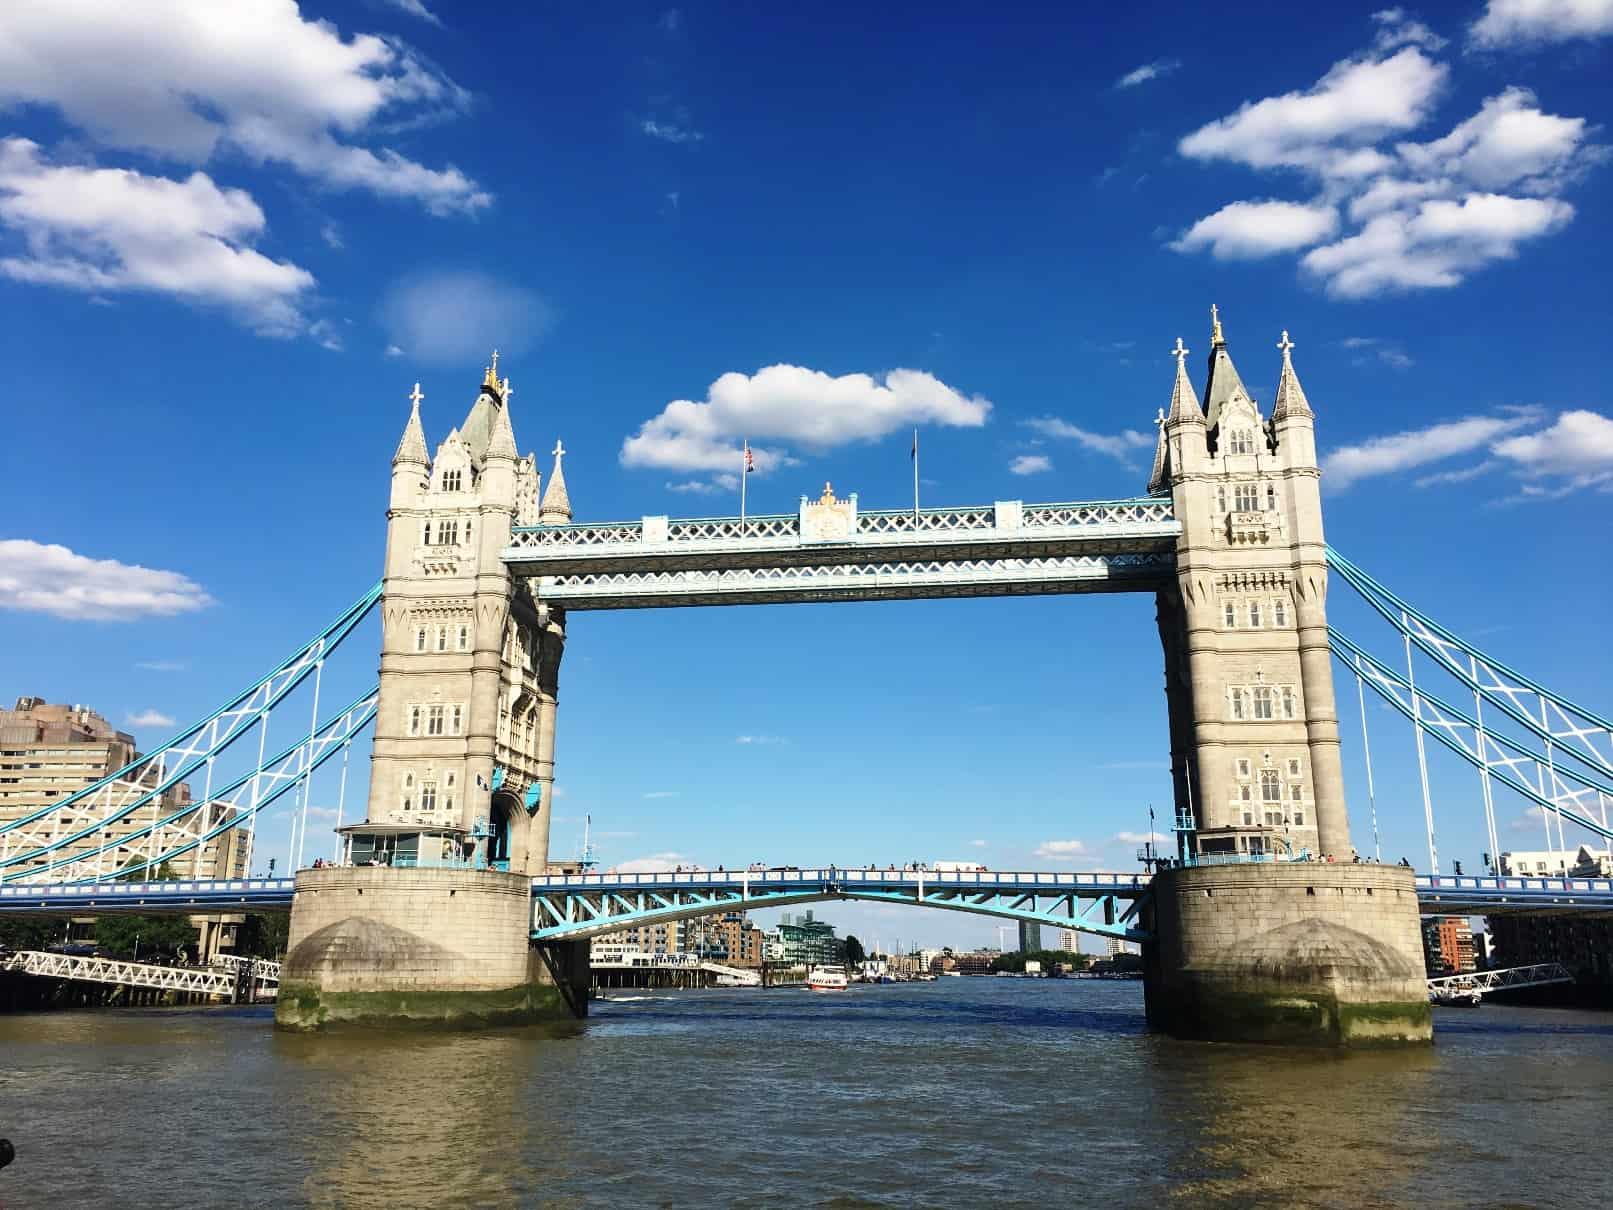 Urlaub Vereinsausflug London